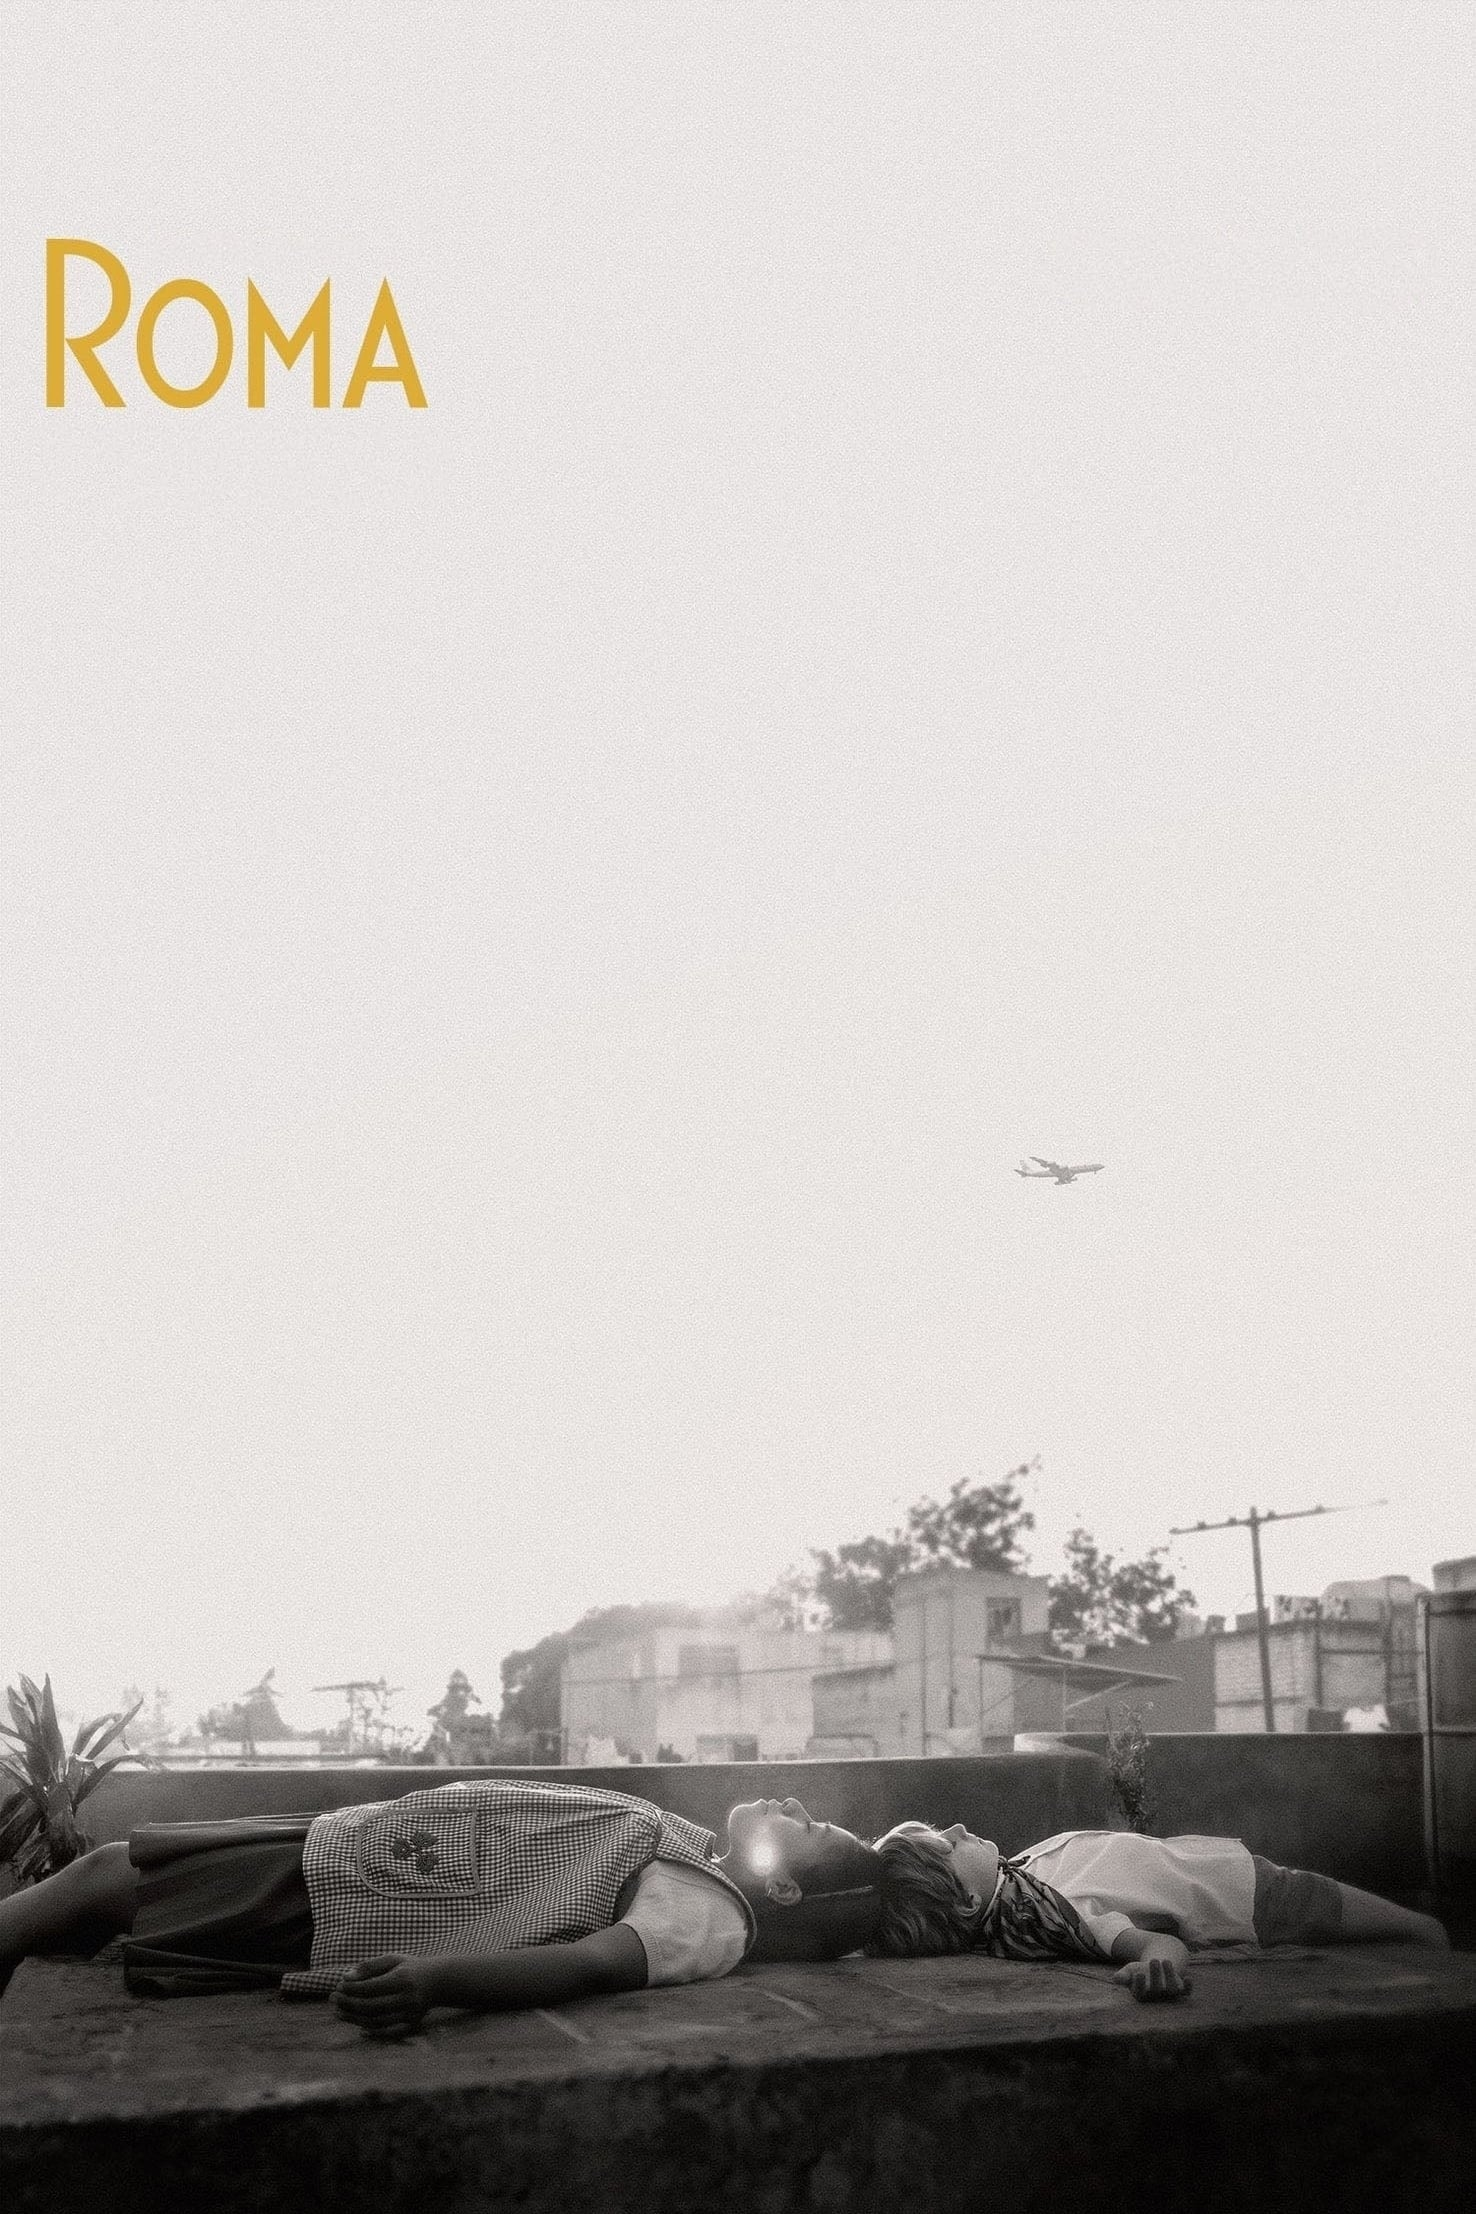 Poster and image movie Film Roma - Roma 2018